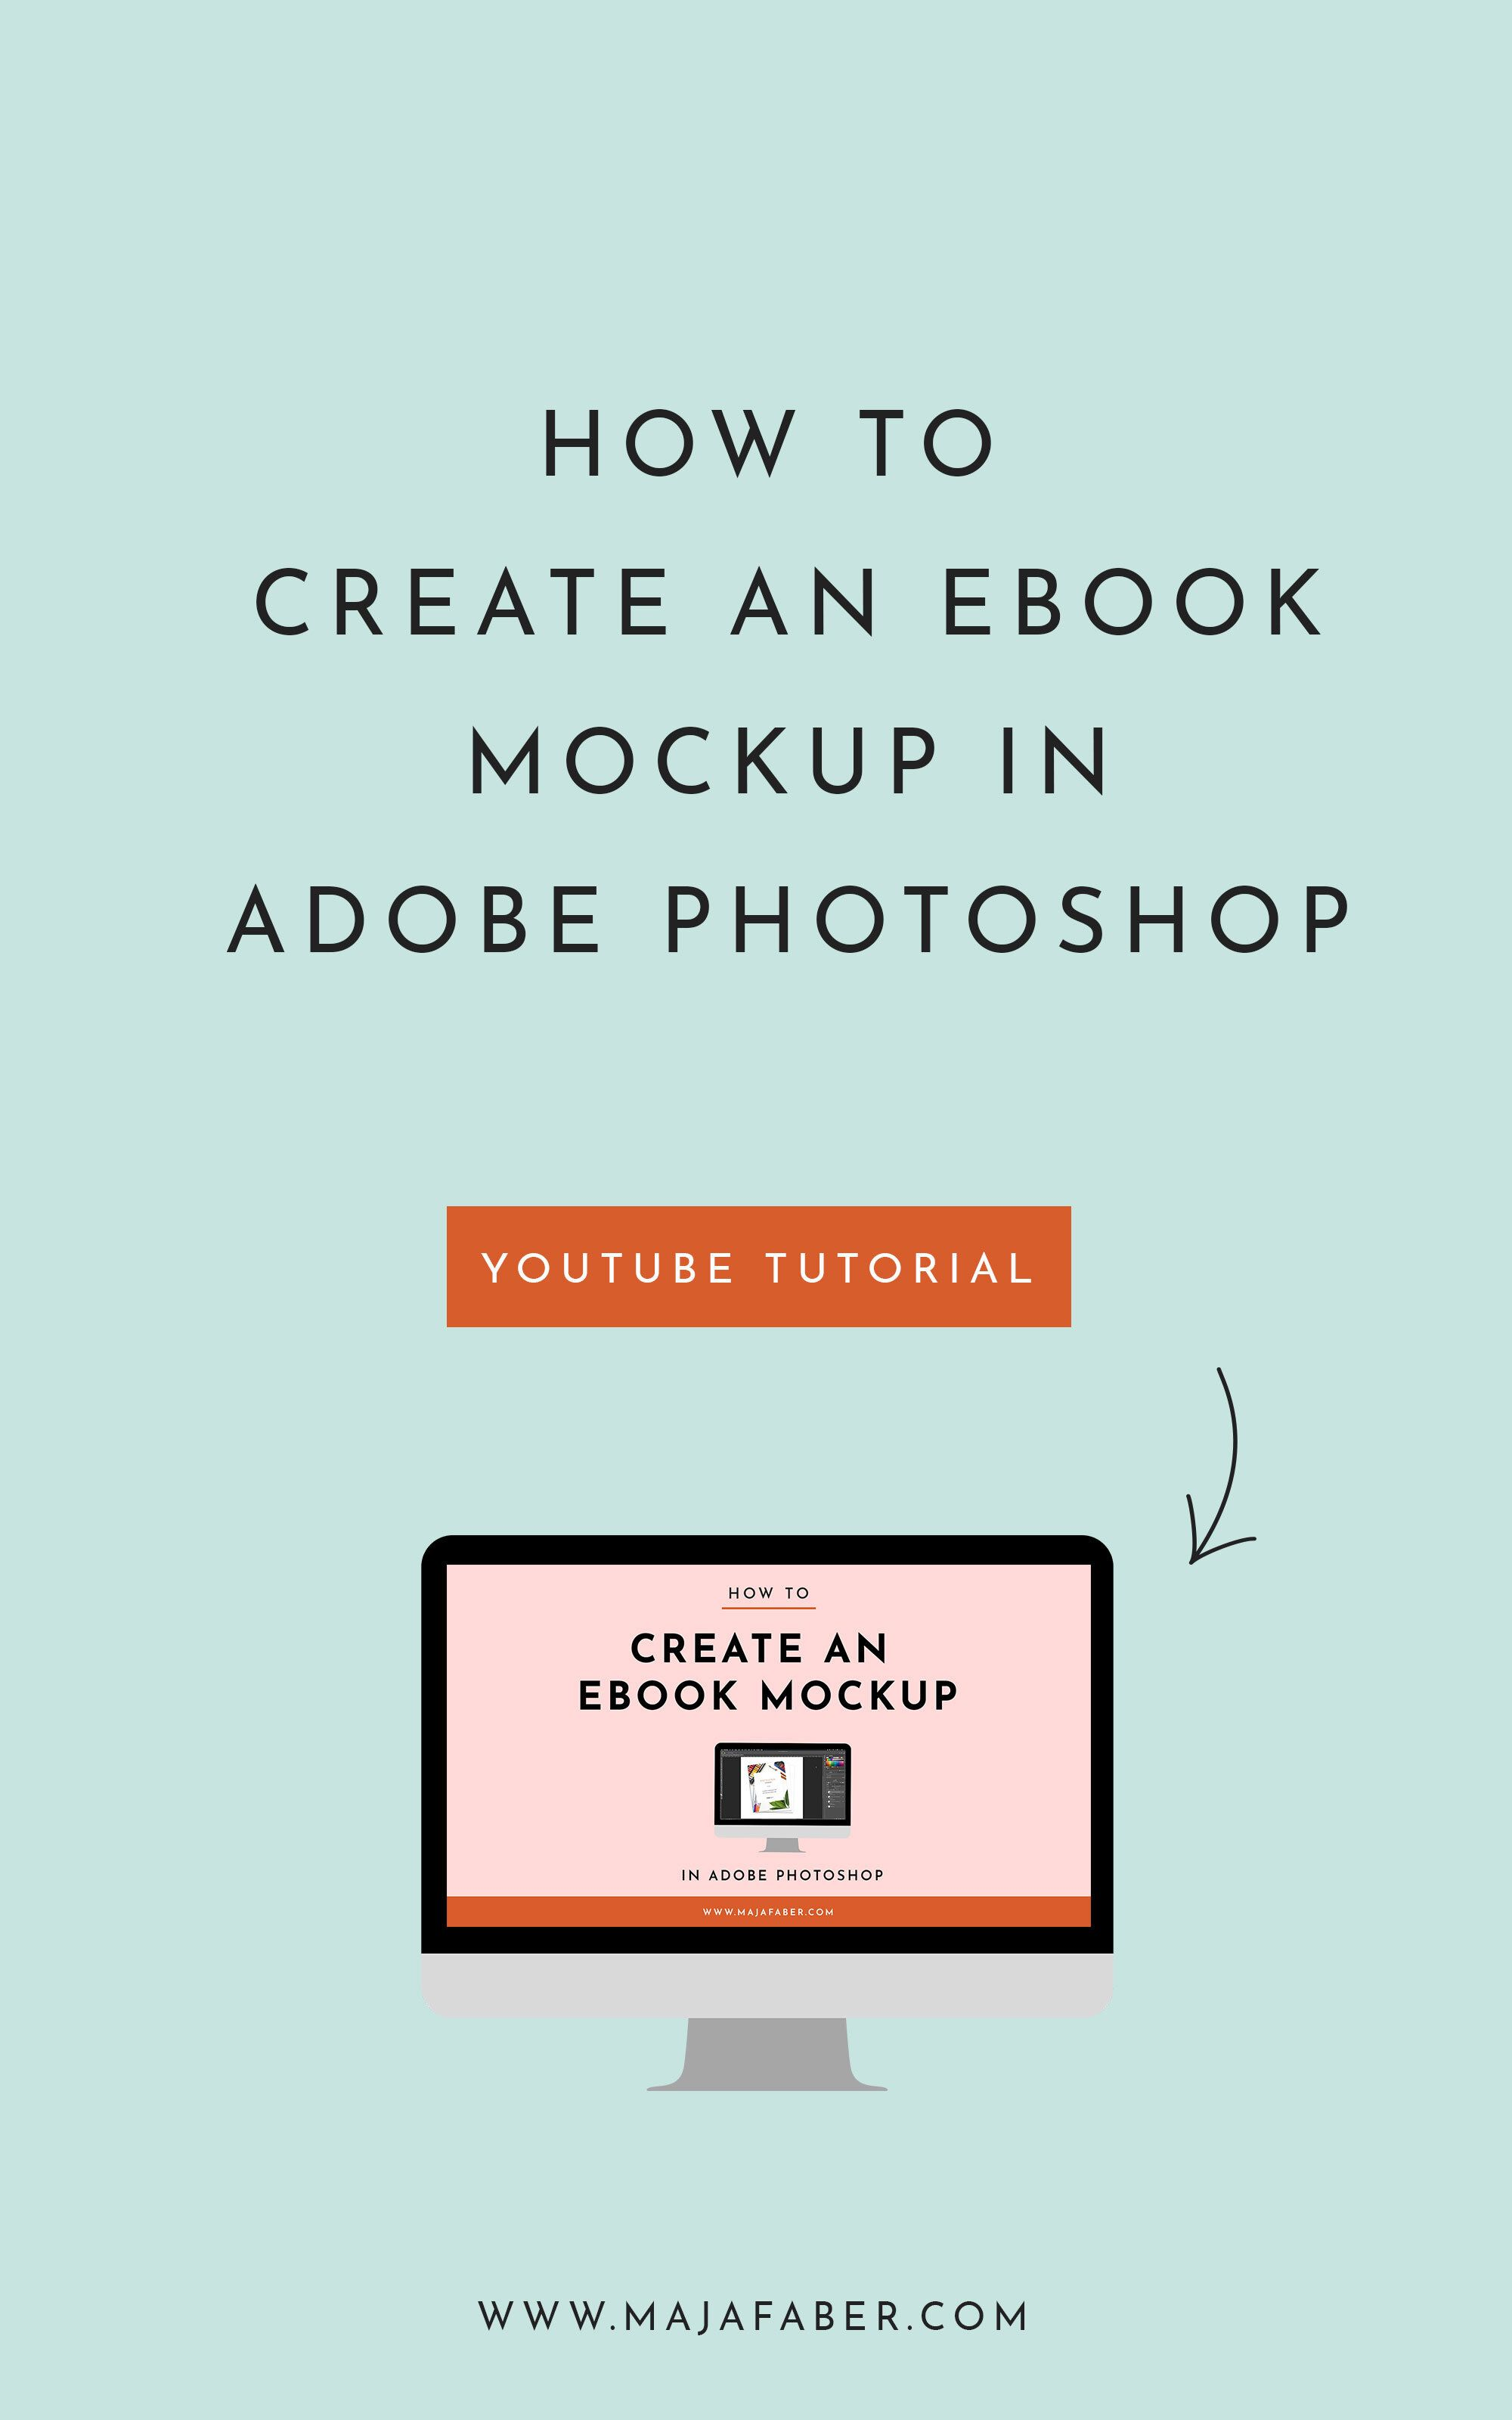 How To Create An Ebook Mockup In Adobe Photoshop In 2020 Photoshop Ebook Photoshop Youtube